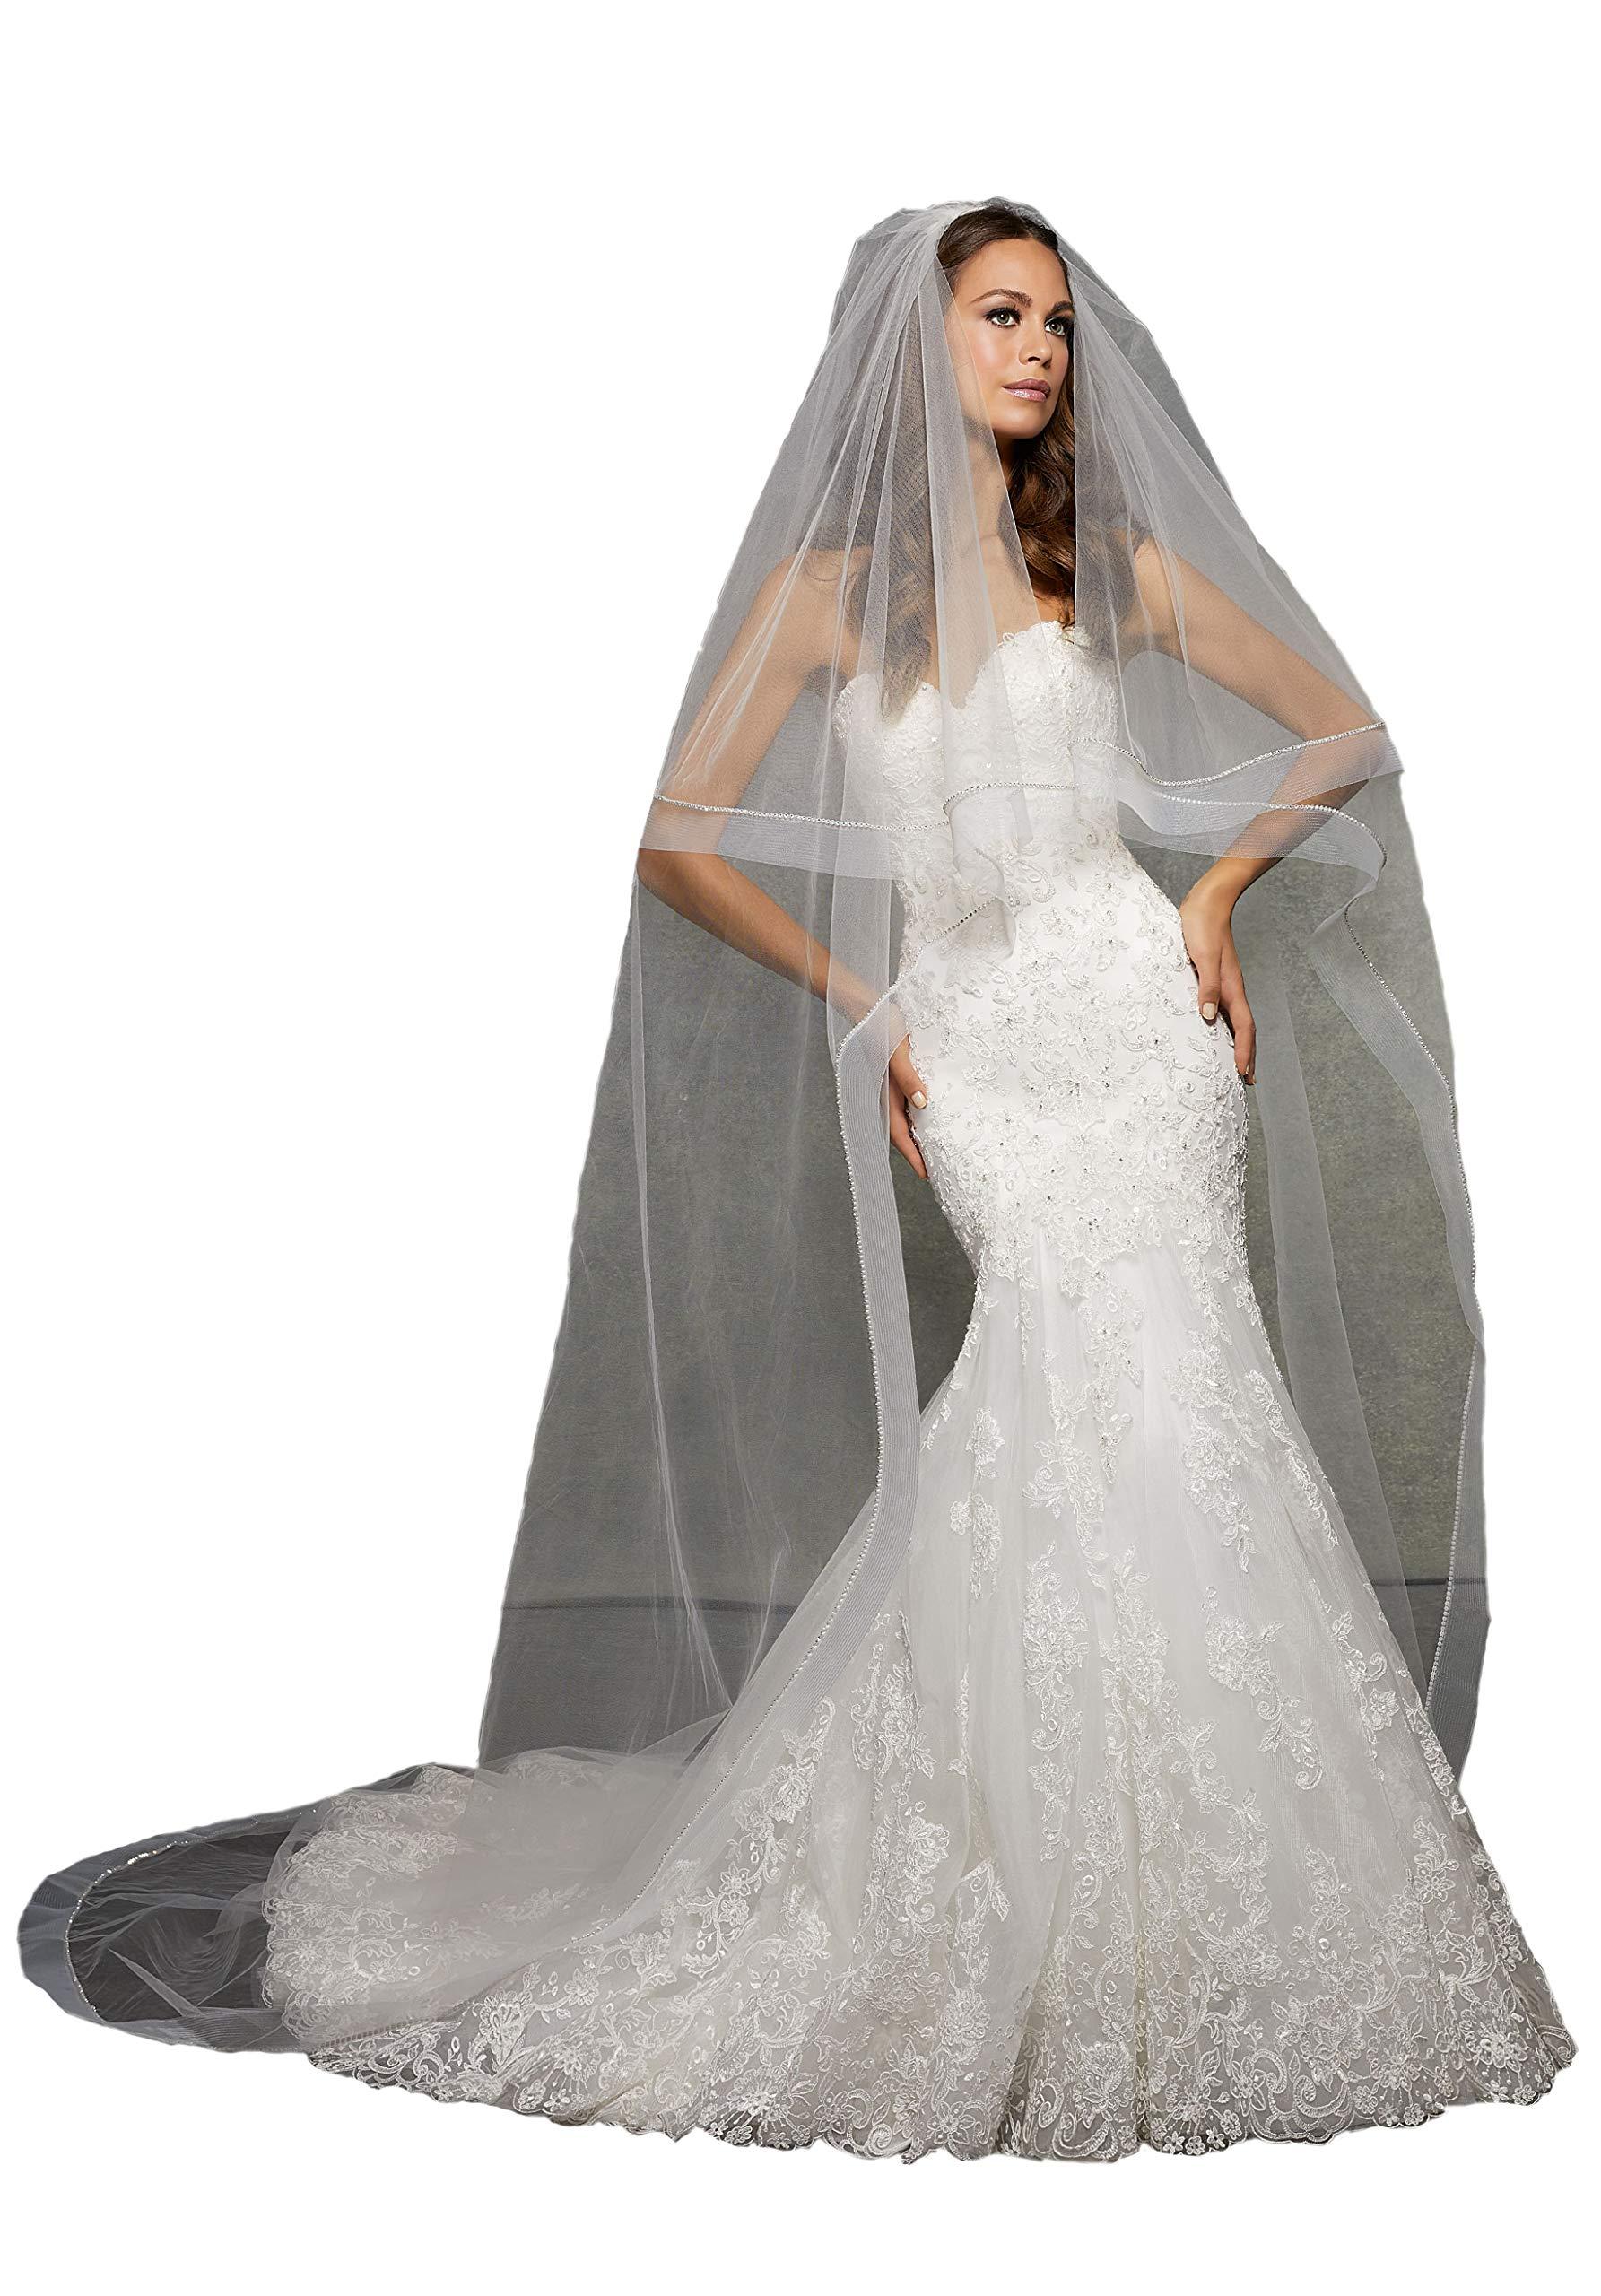 Passat Ivory XLCathedral 2T Circular Veil Organza Silk Edged with Rhinestones 2 tier cathedral wedding veil crystals VL1055